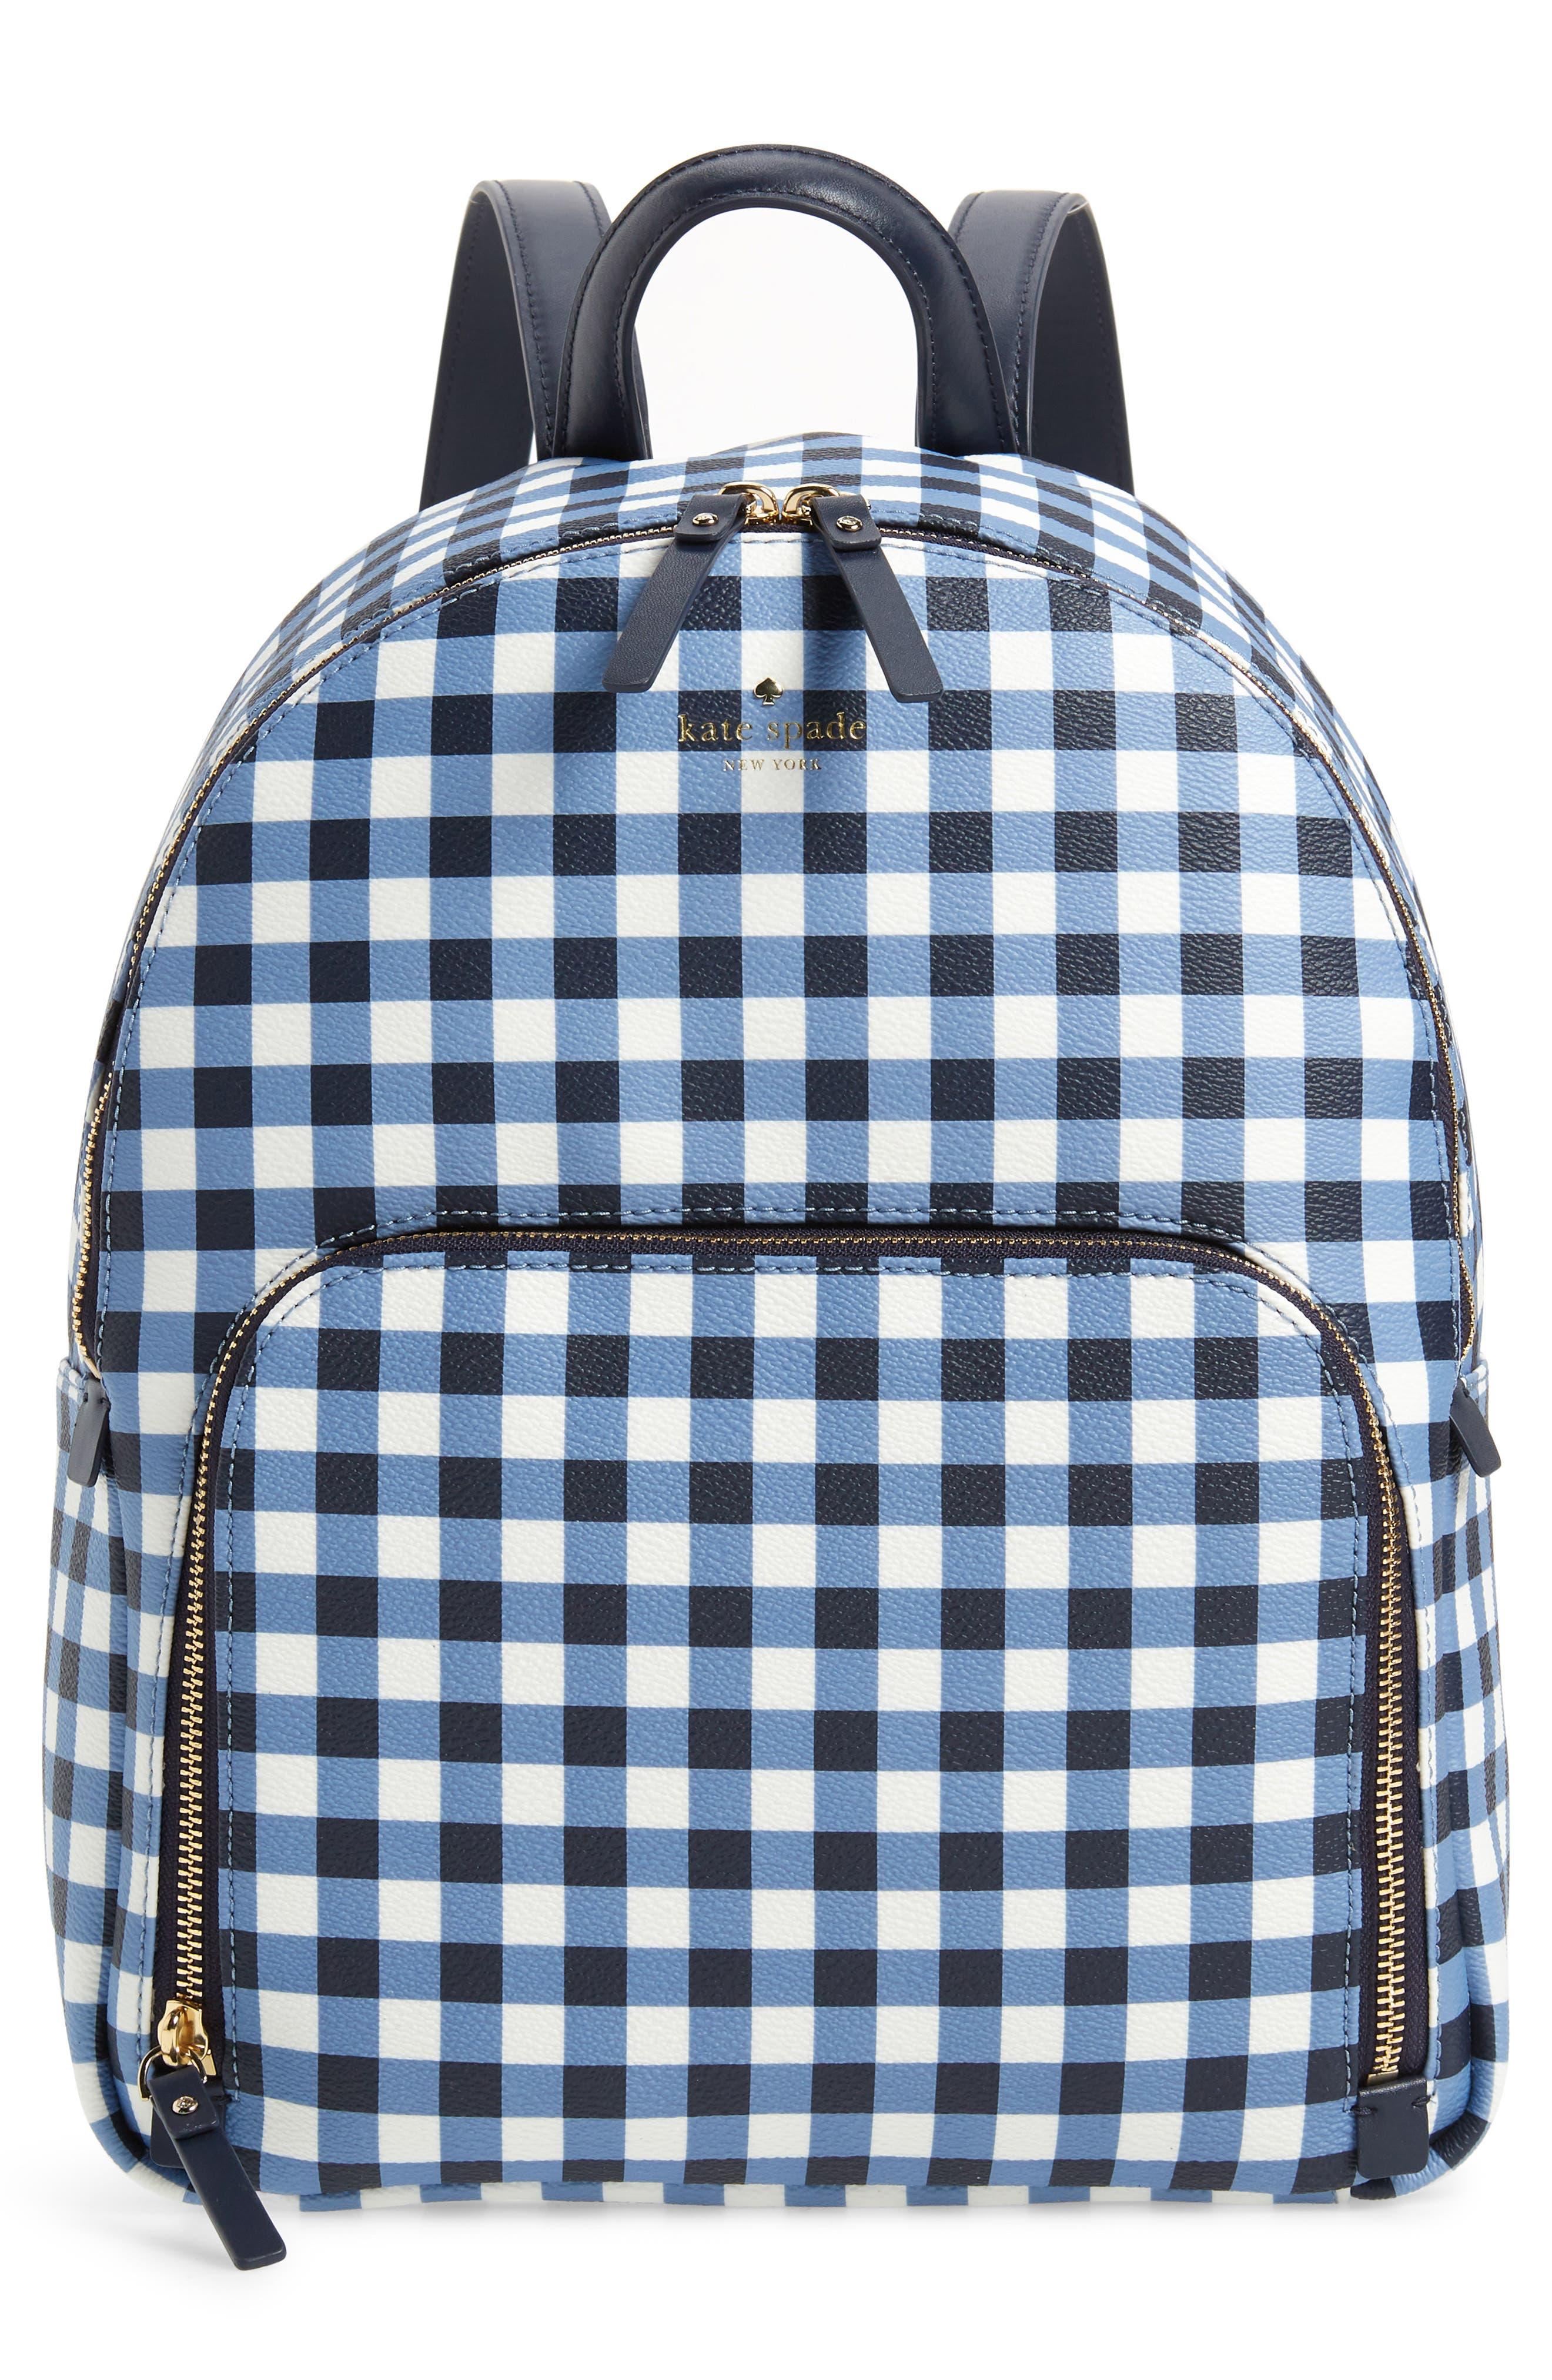 hyde lane hartley gingham backpack,                         Main,                         color, 400